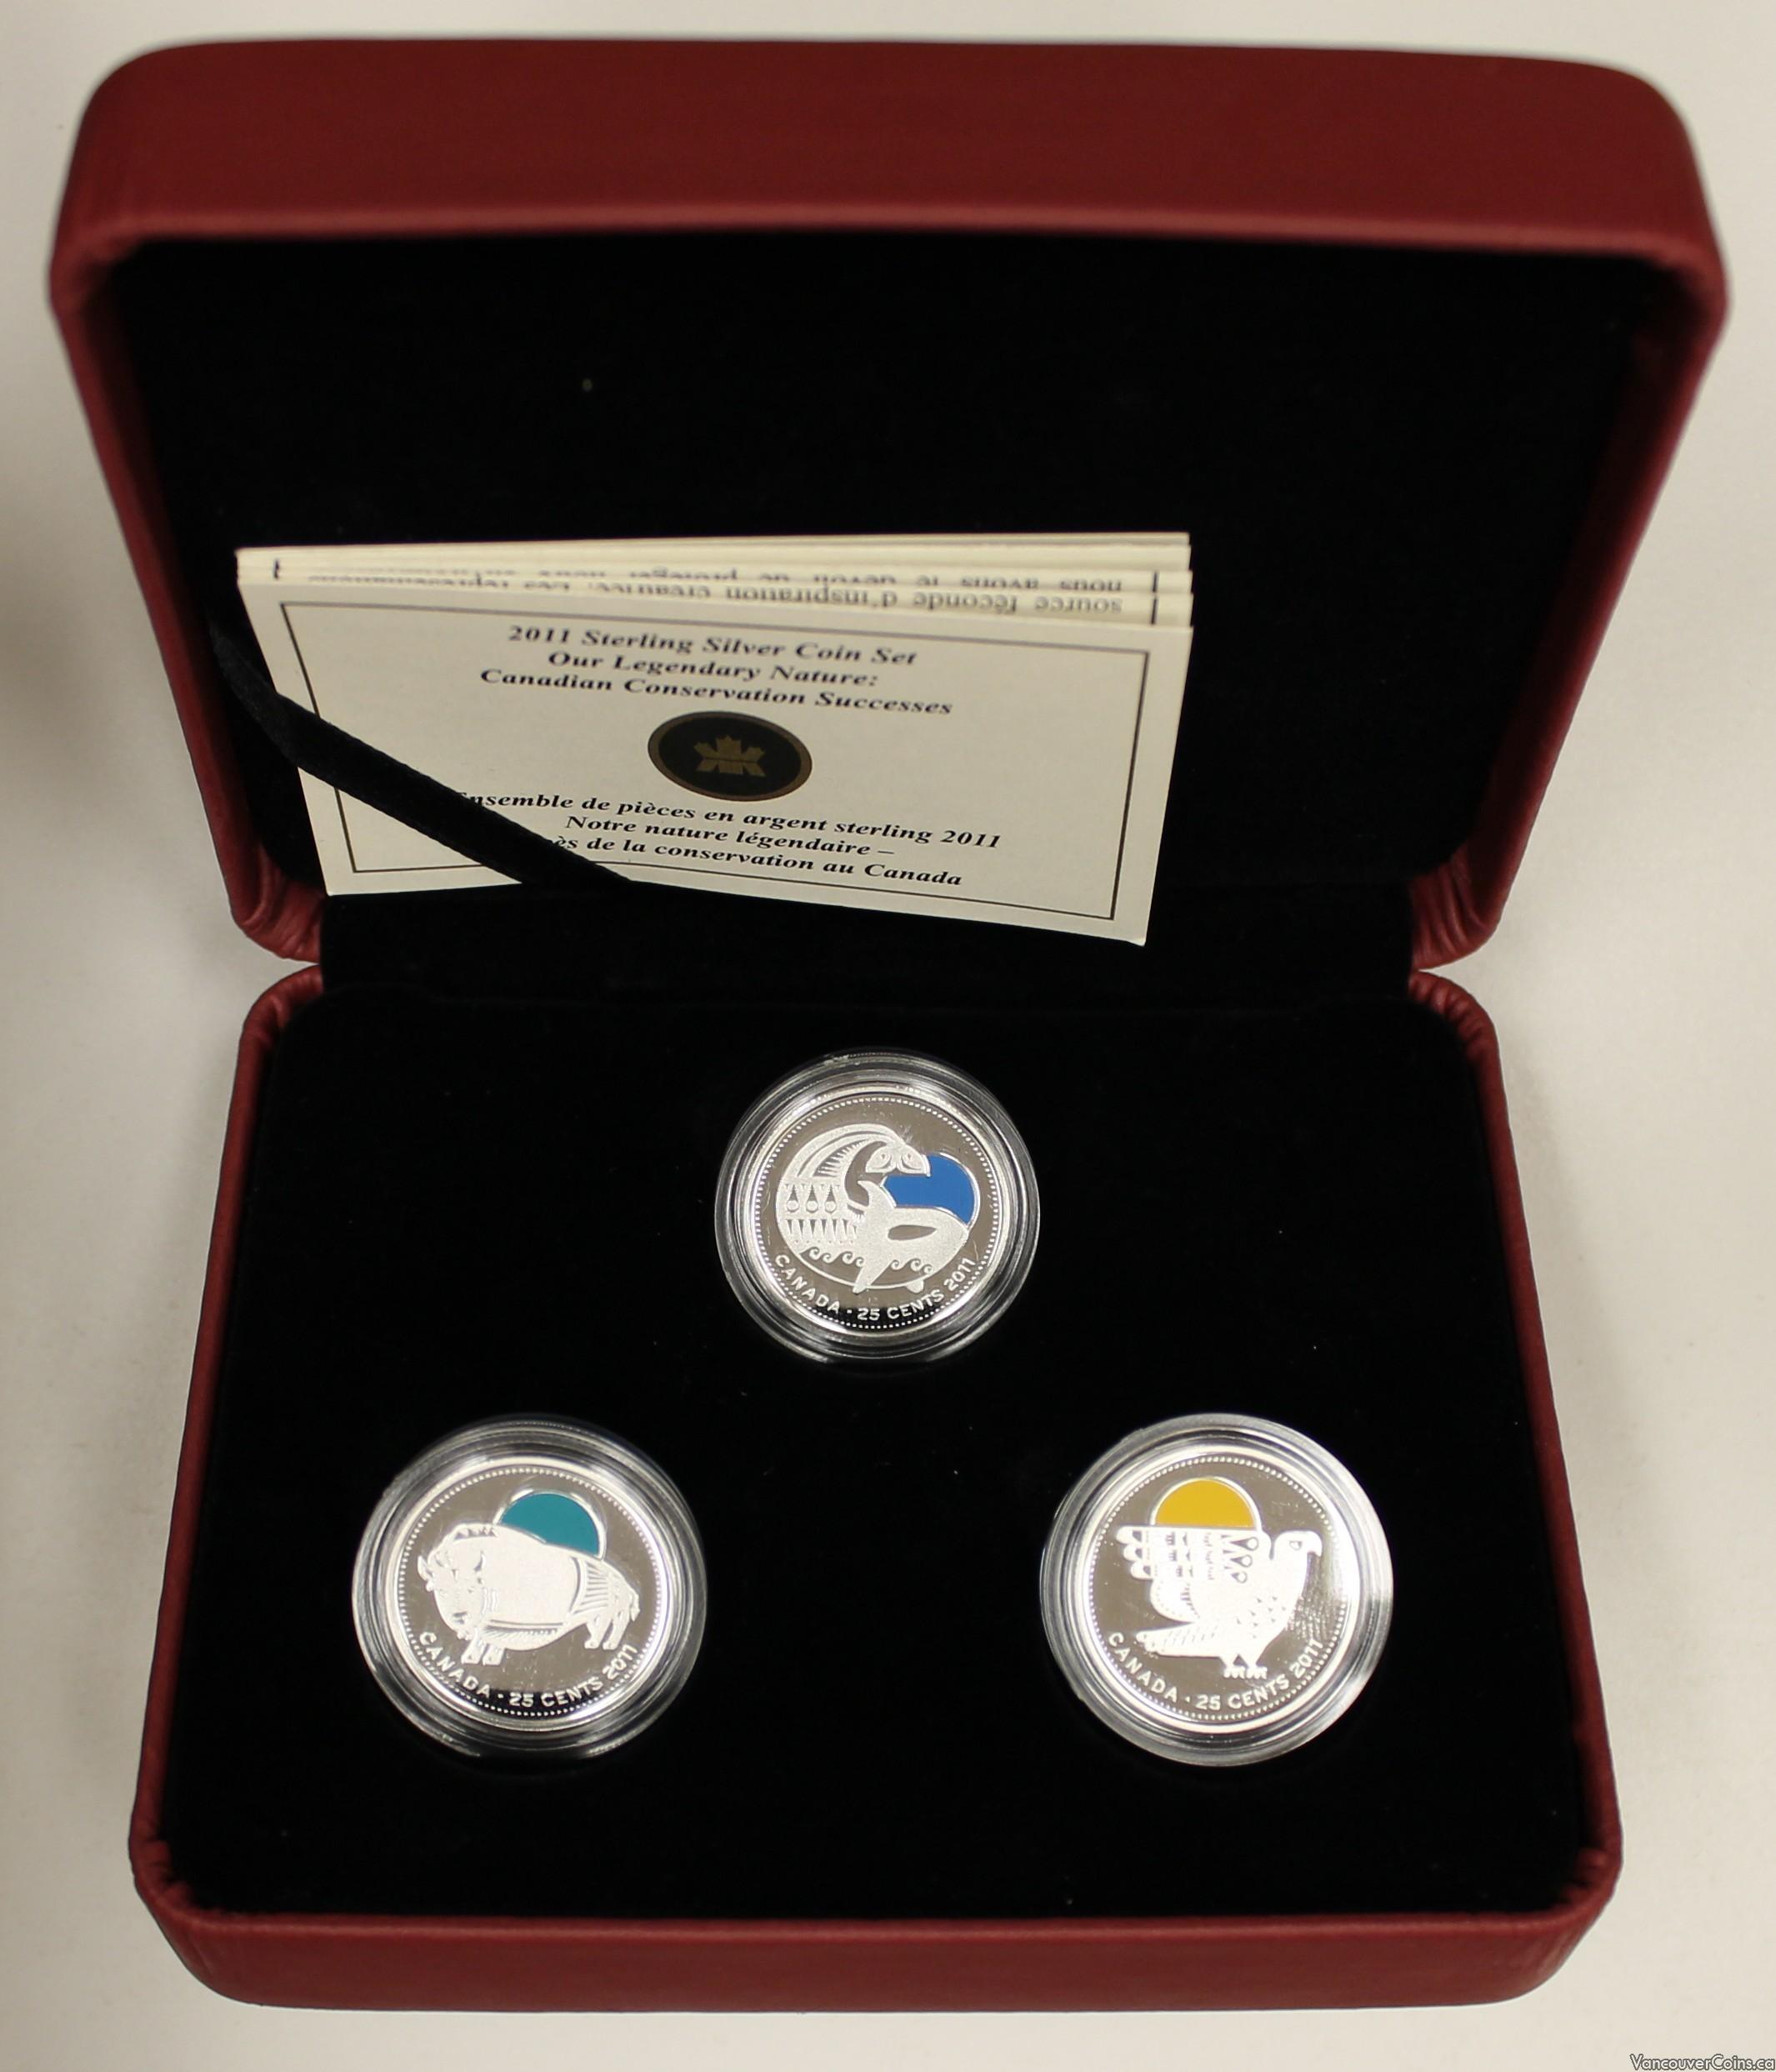 2011 Canada Sterling Silver Quarter Set Our Legendary Nature